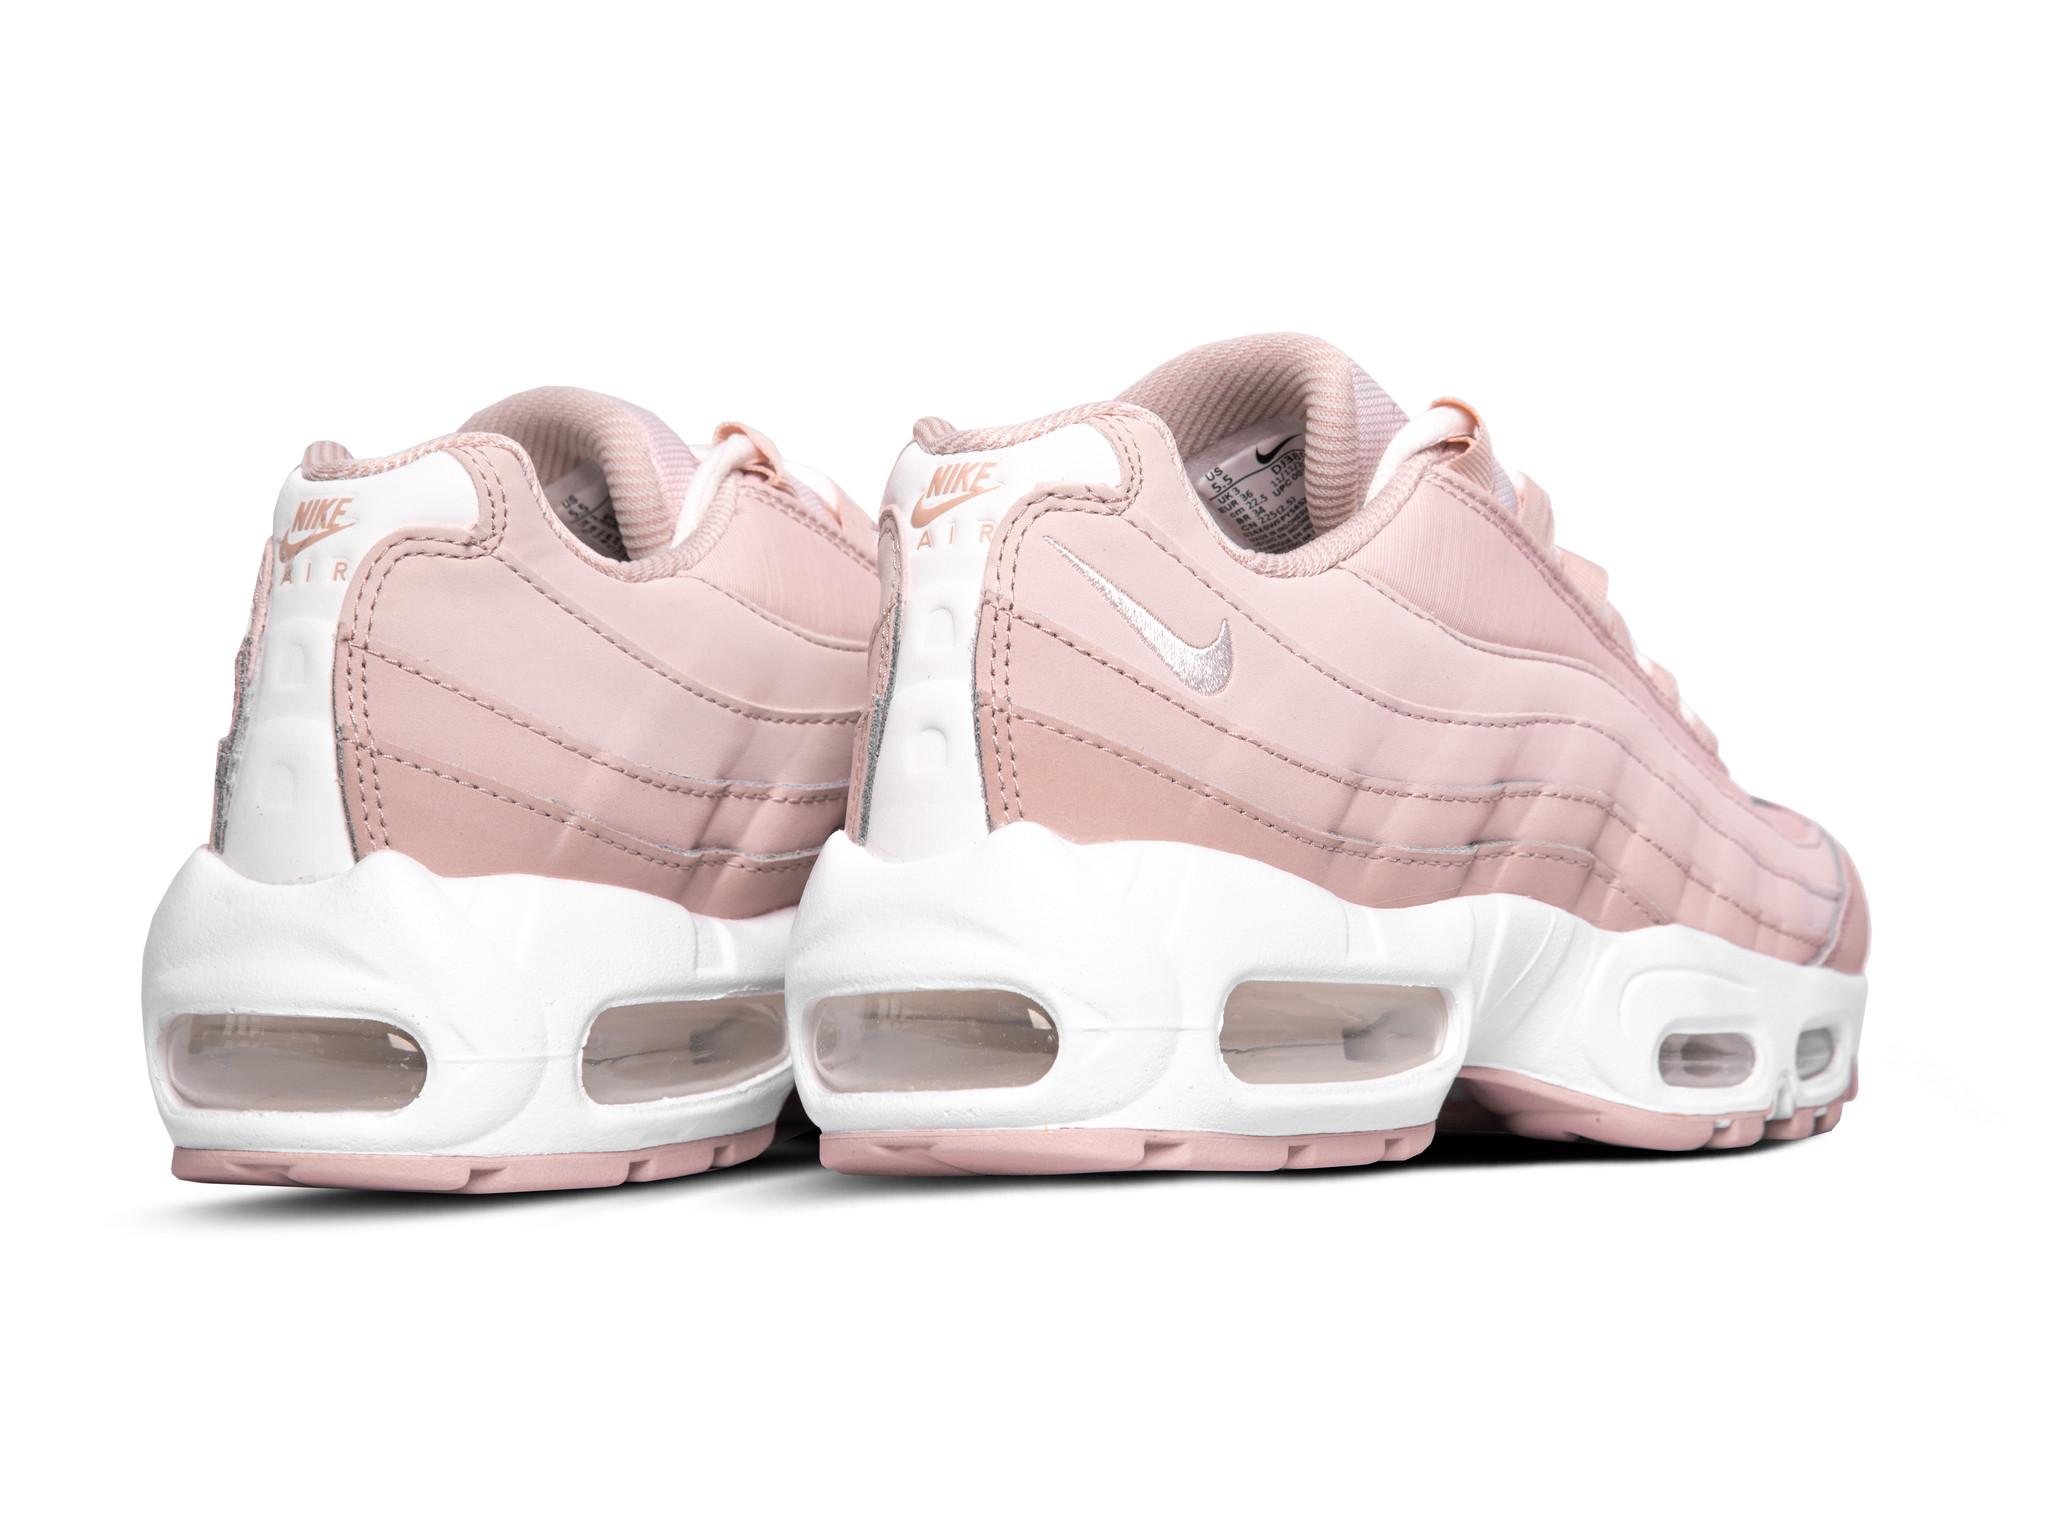 Nike W Air Max 95 Pink Oxford Summit White Barely Rose DJ3859 600